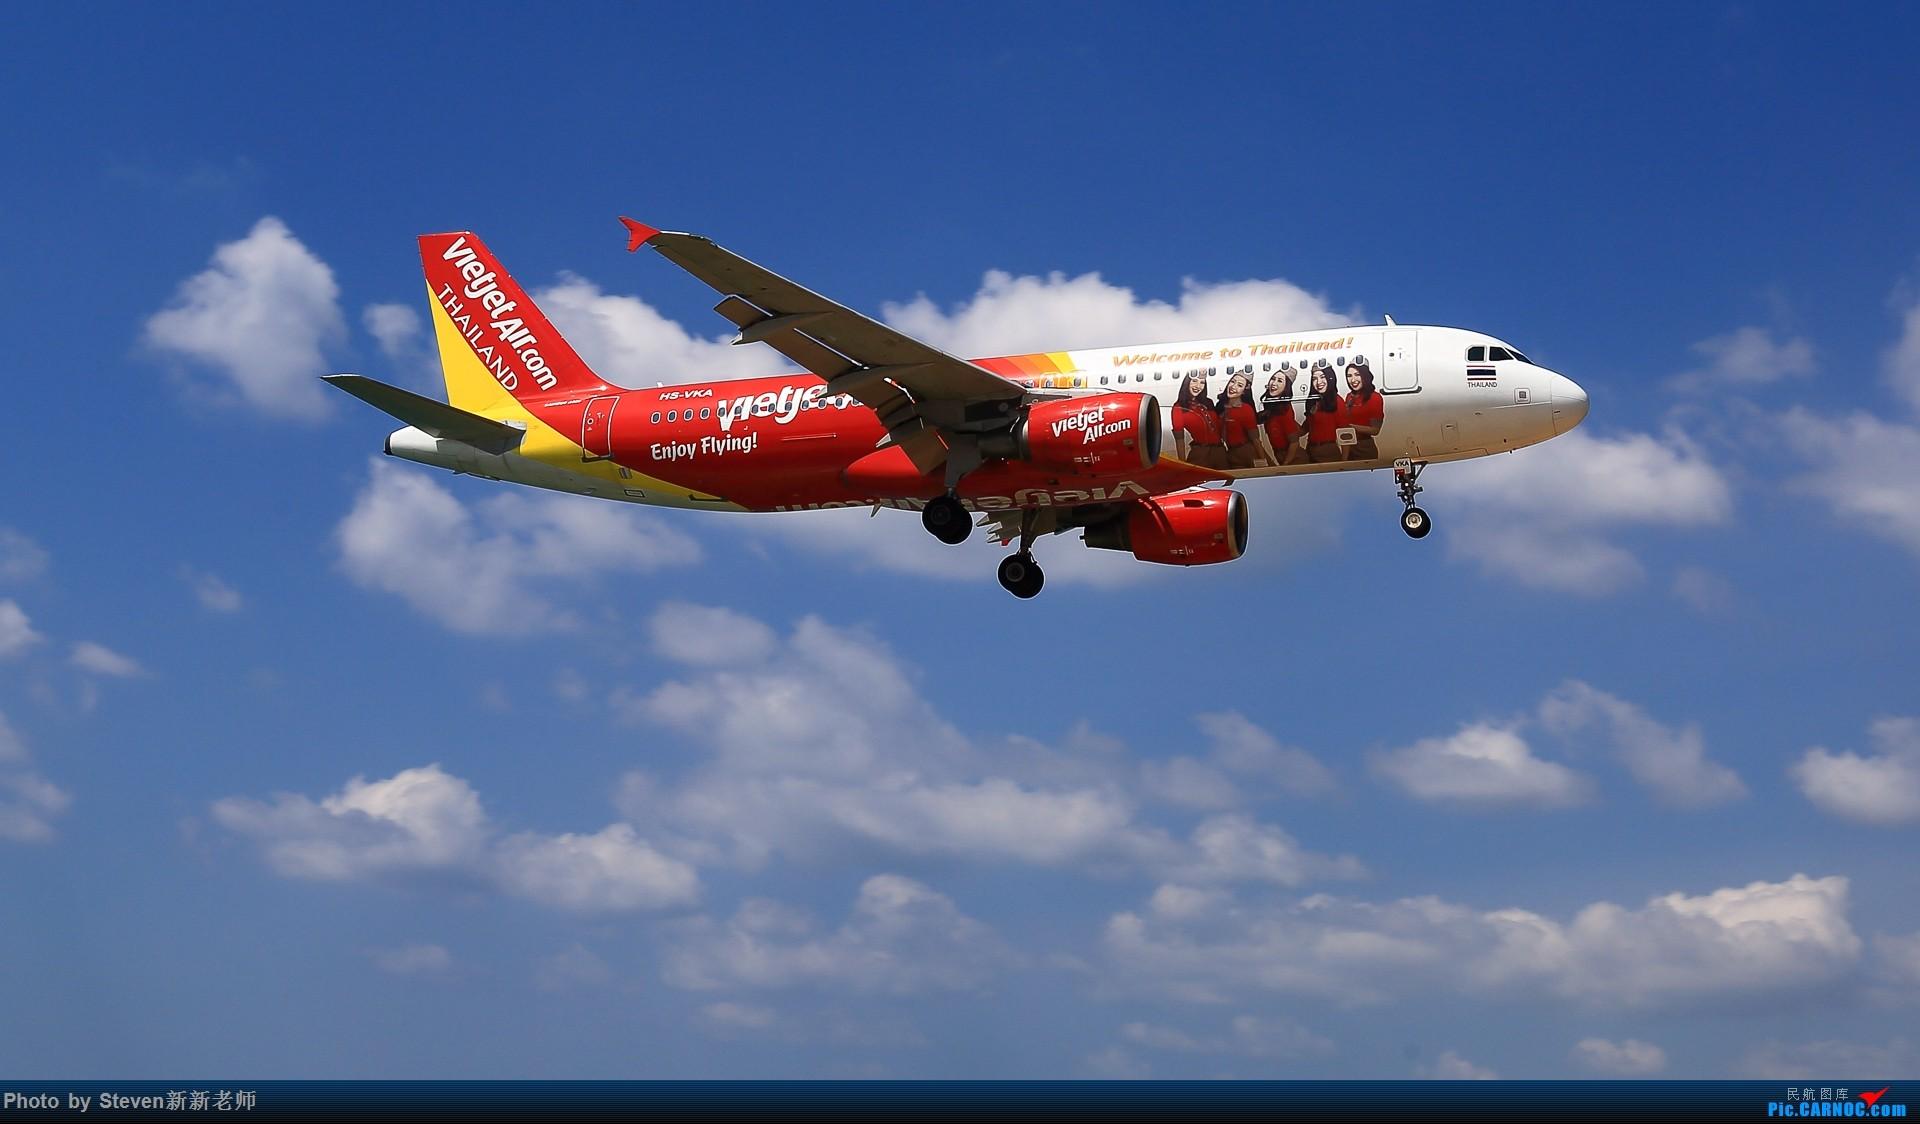 "Re:[原创]亚洲""圣马丁岛""—普吉国际机场拍机 AIRBUS A320-200 HS-VKA 泰国普吉机场"